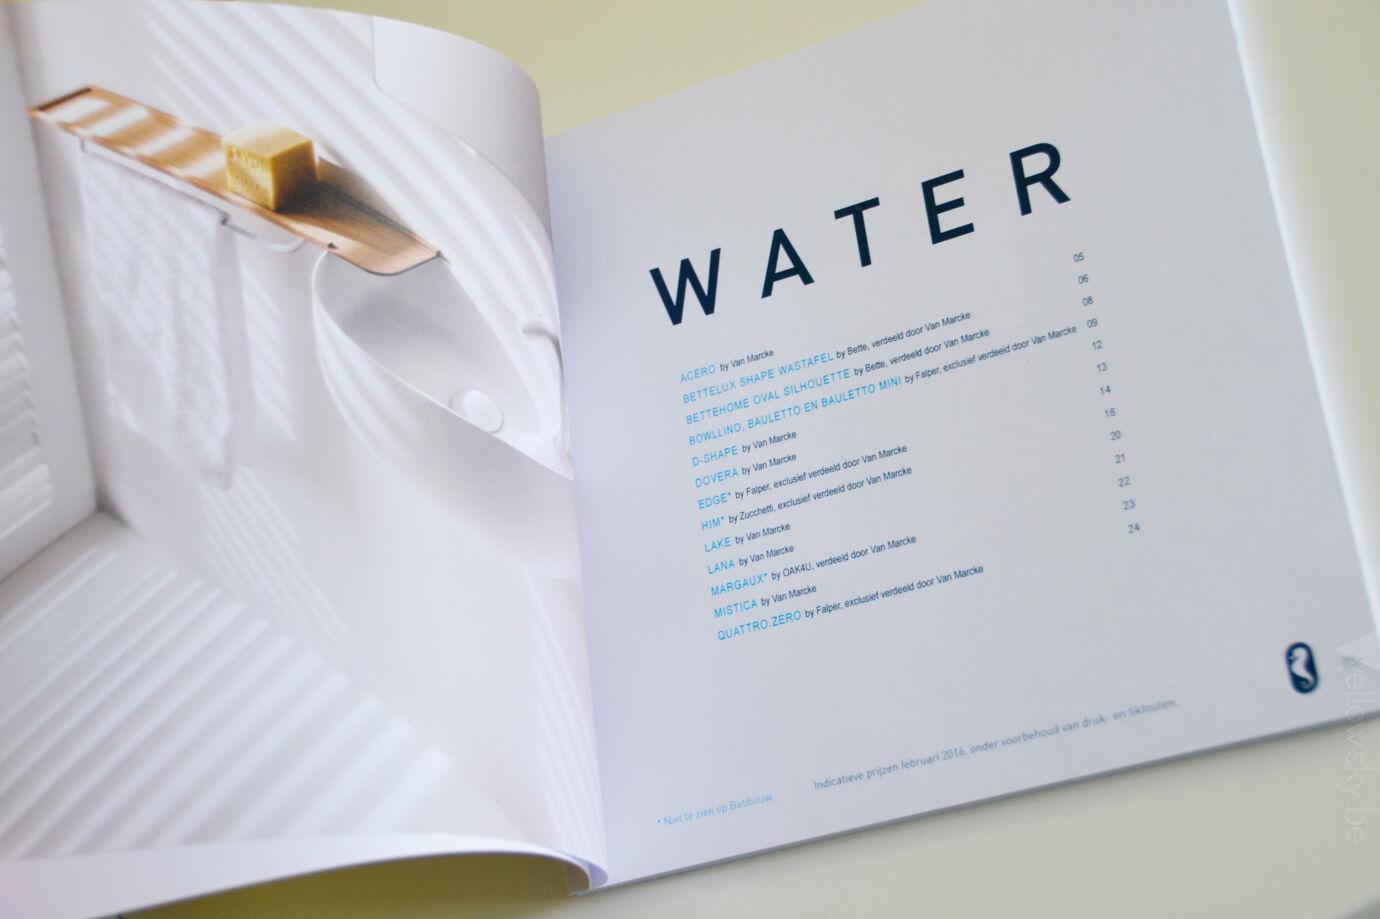 Yellowsky vanmarcke water 01 Dageraad Vereecke